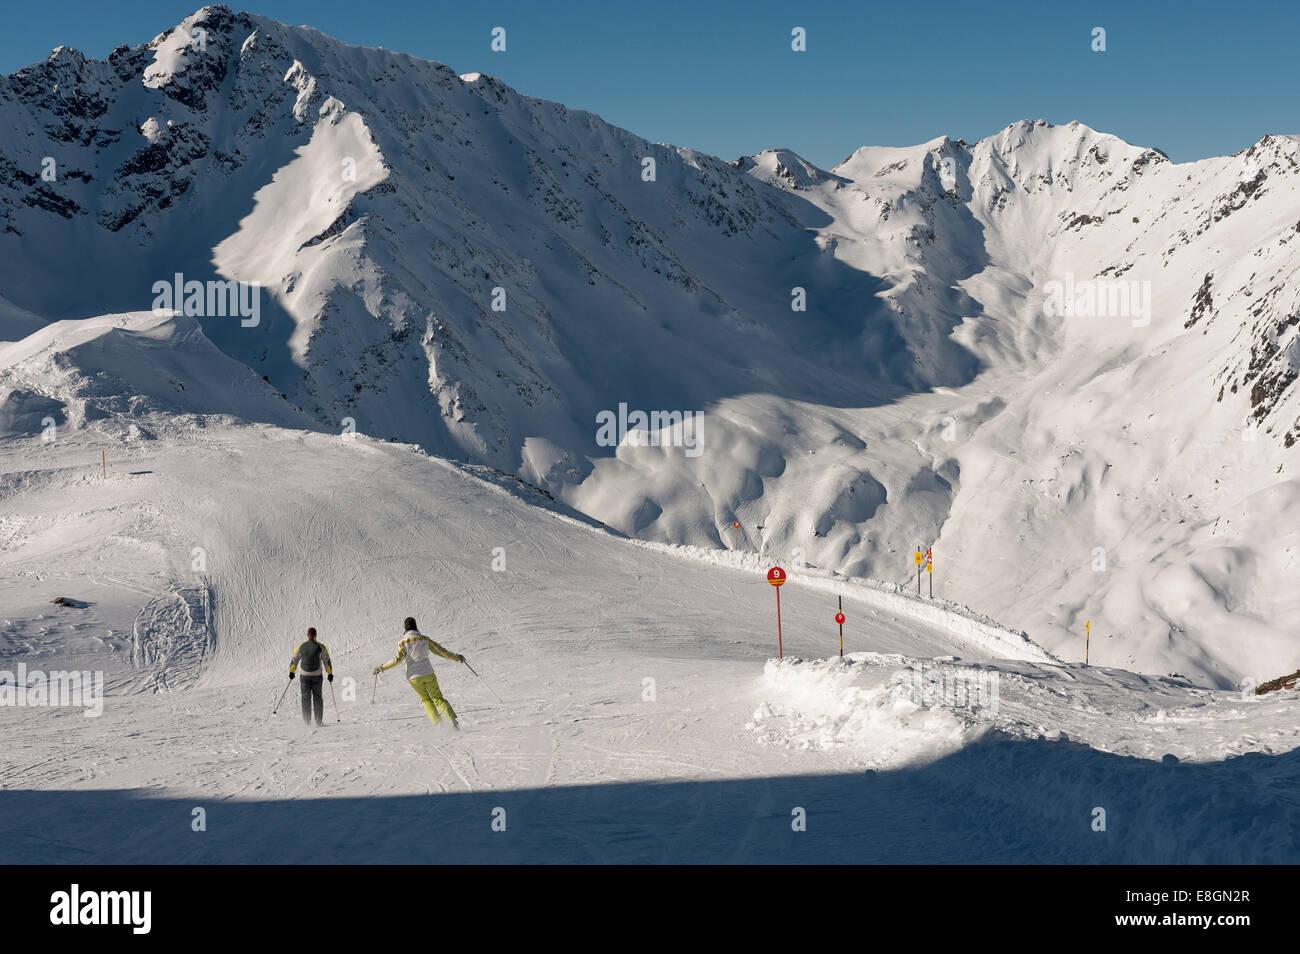 Skiers at Mt Alblittkopf, Lattenabfahrt ski run, Kappl-Sunny Mountain ski resort, Paznaun Valley, Kappl, Tyrol, - Stock Image